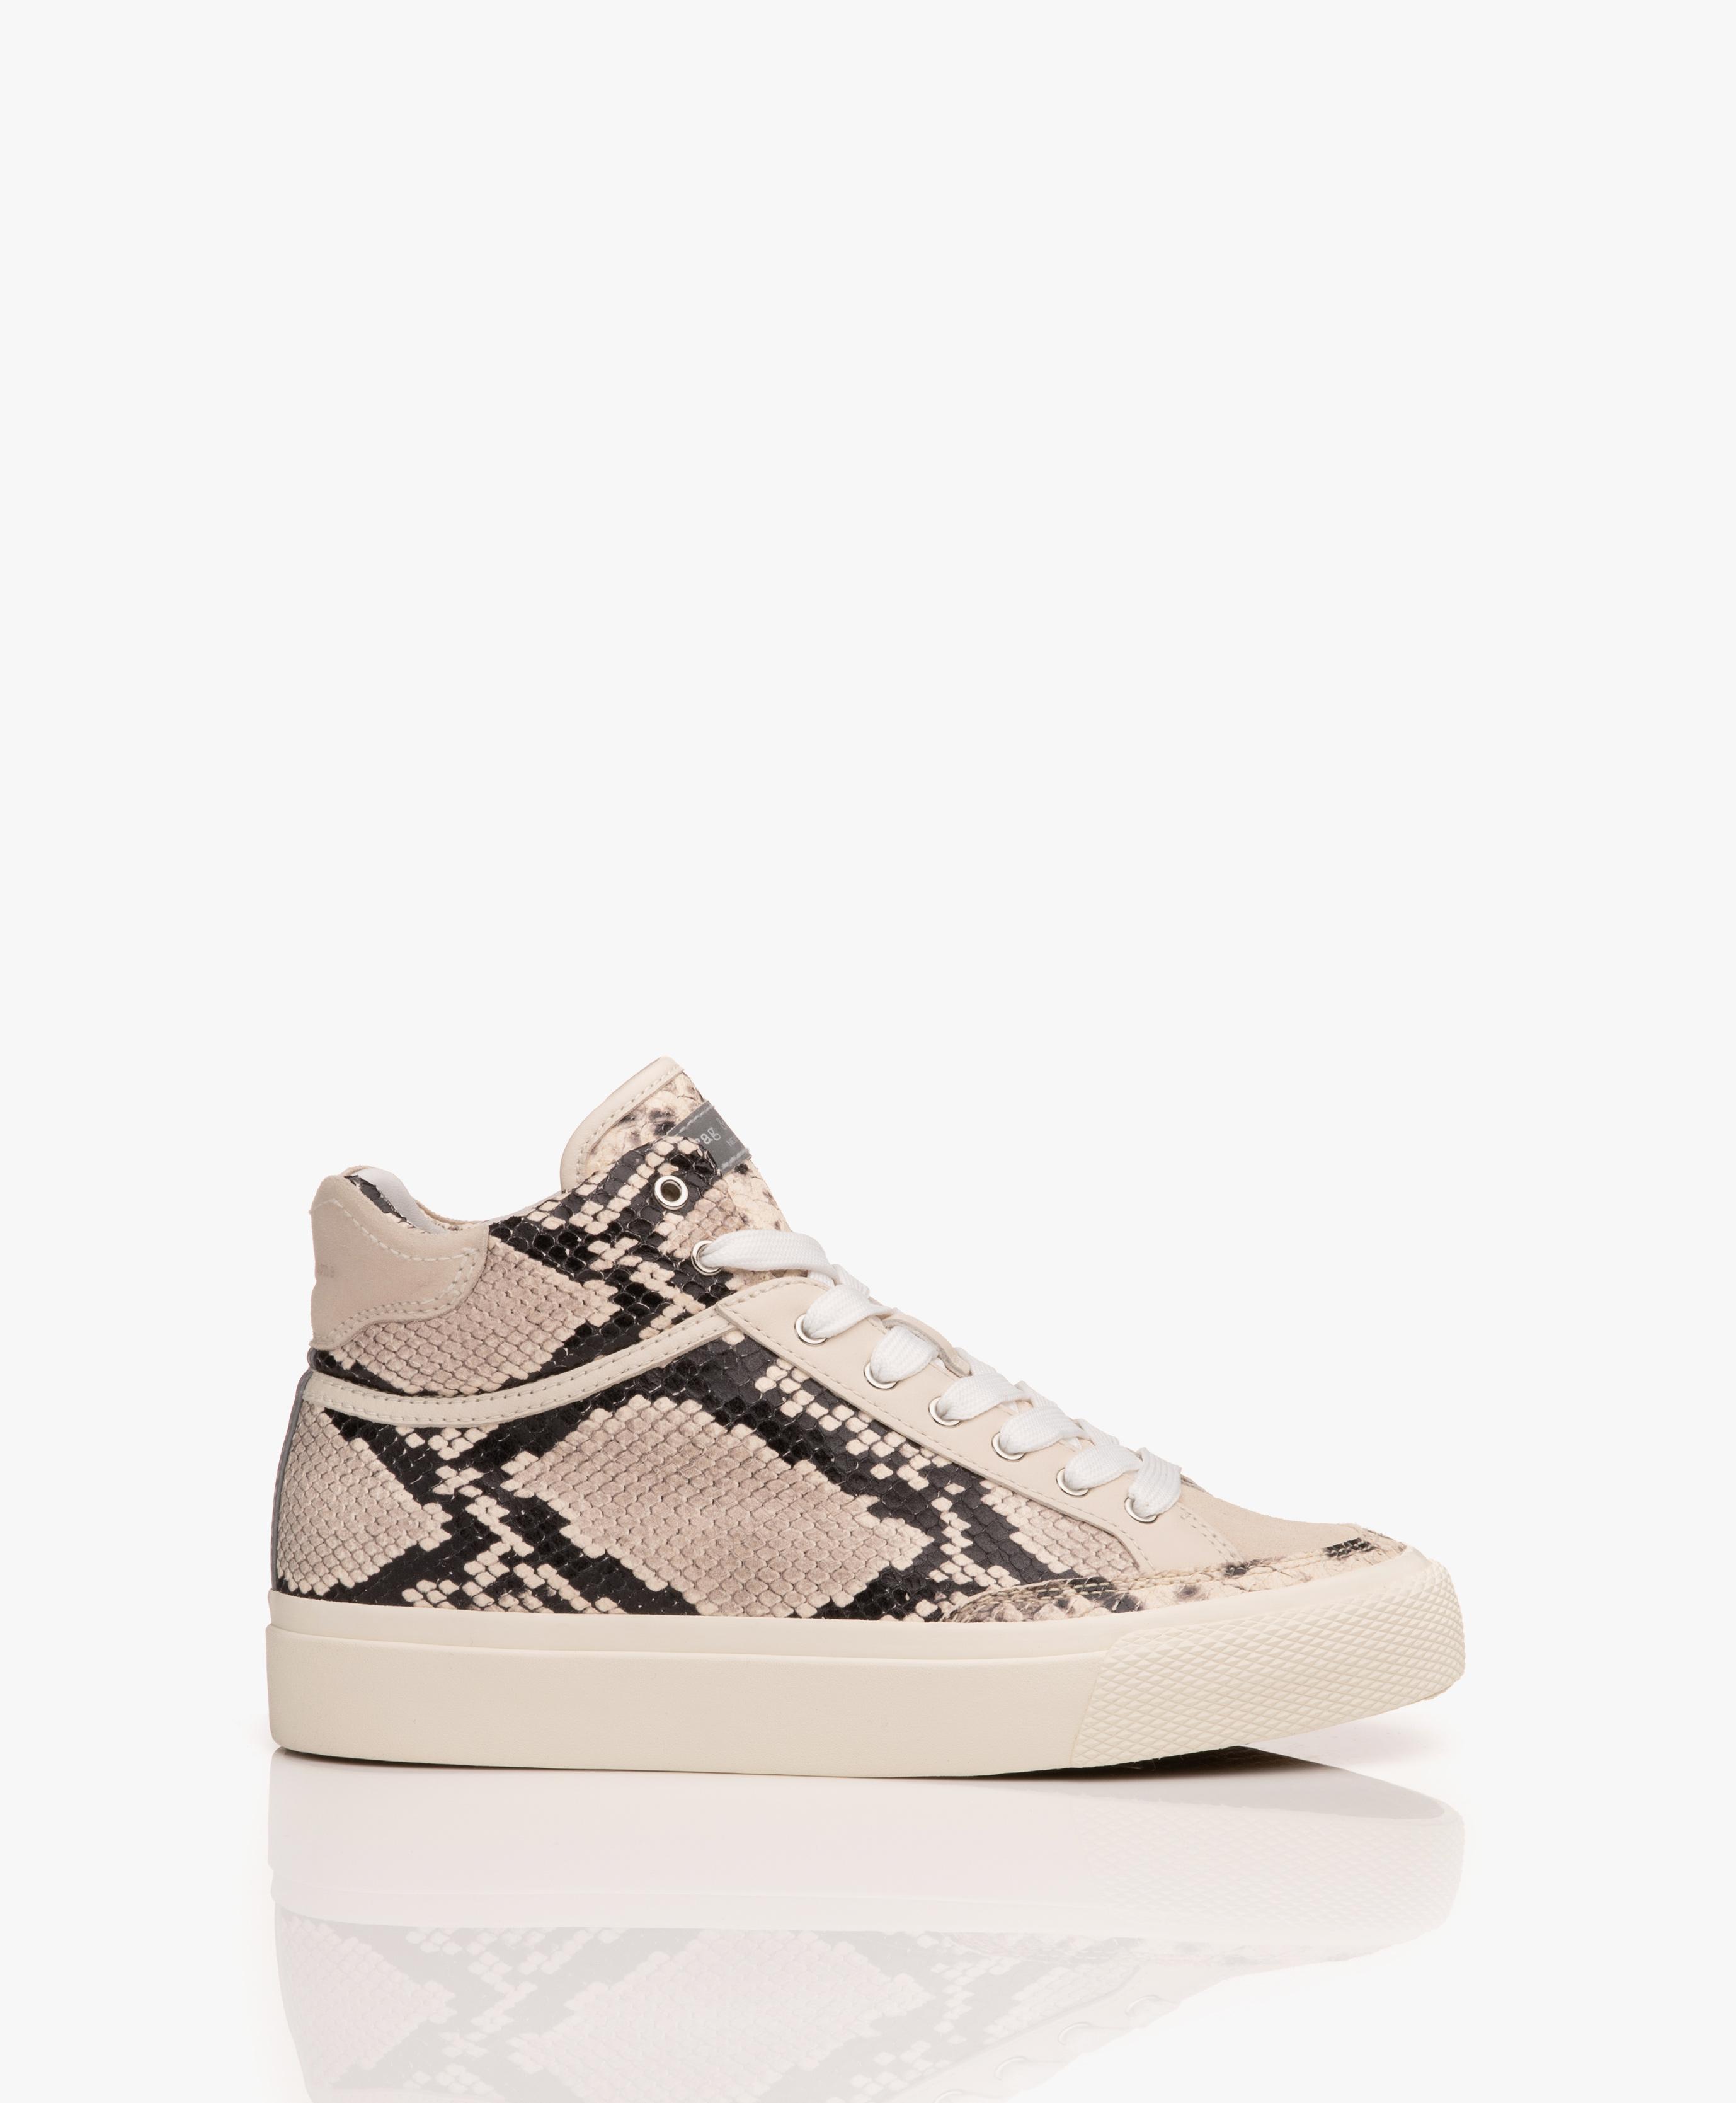 eb151e0c54d3 Rag   Bone RB Army High Leather Snake Print Sneakers - Ecru Black - rb army  high w292f241d